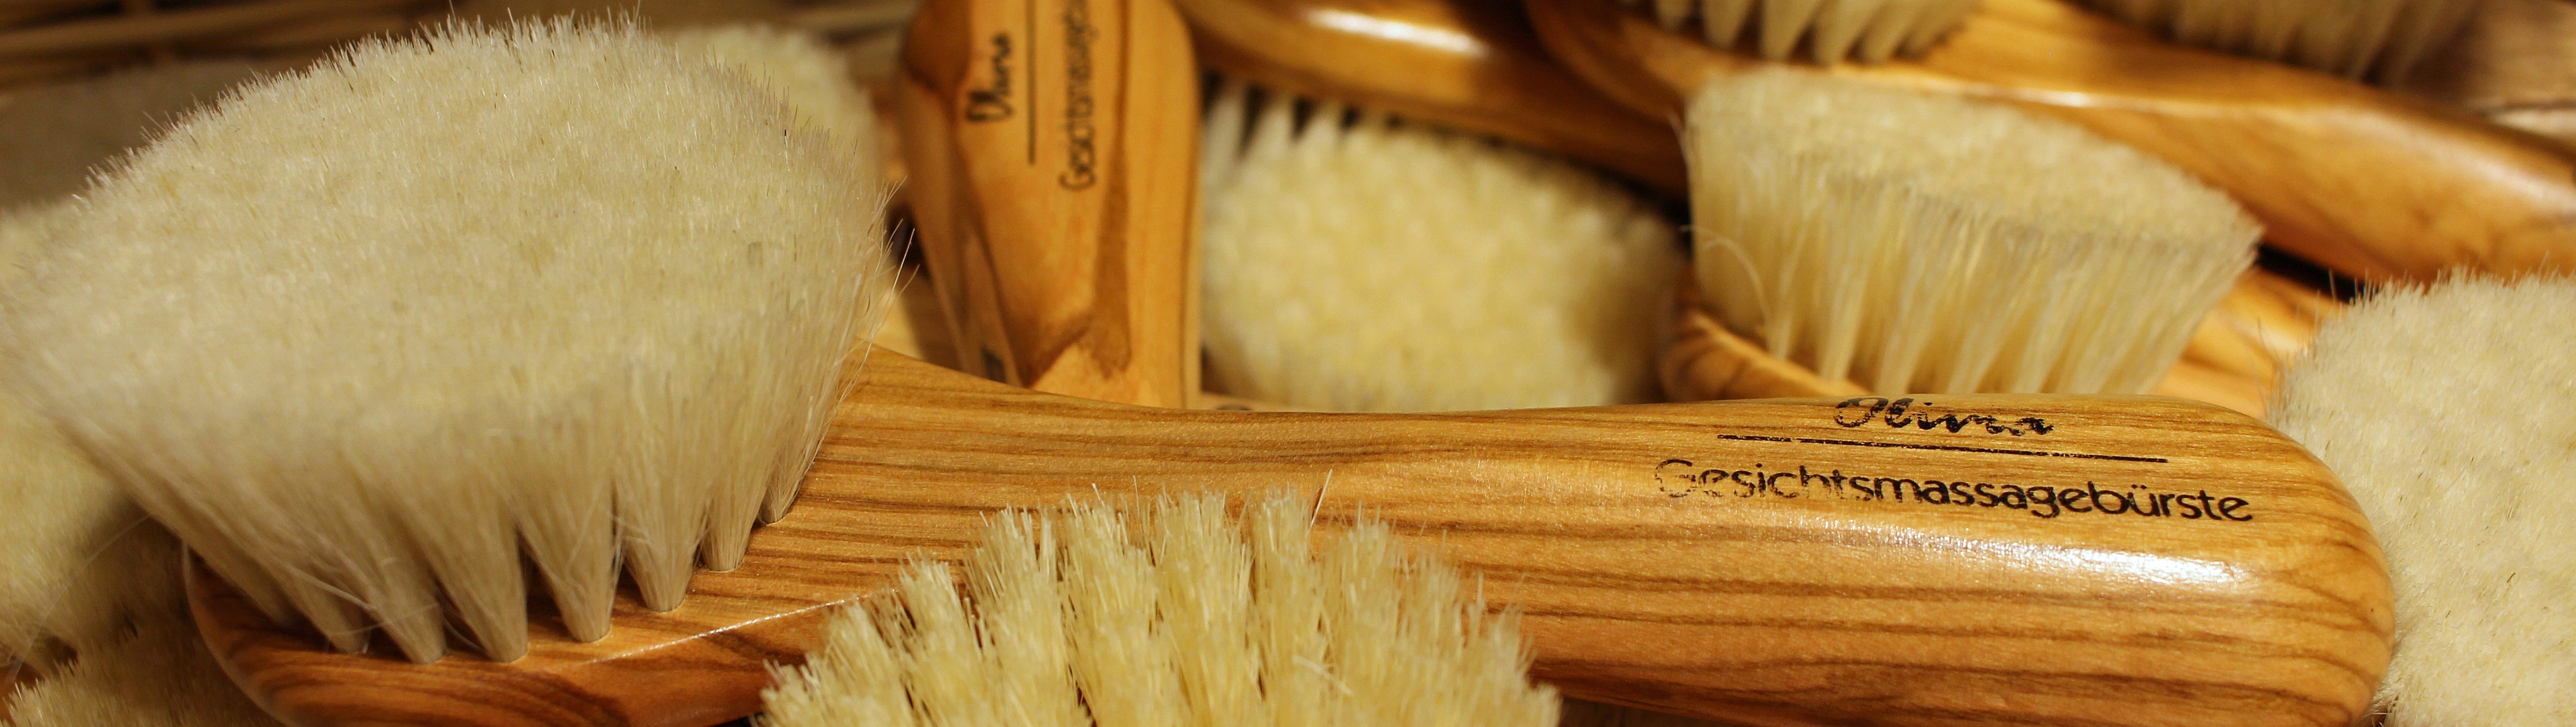 Brush makers